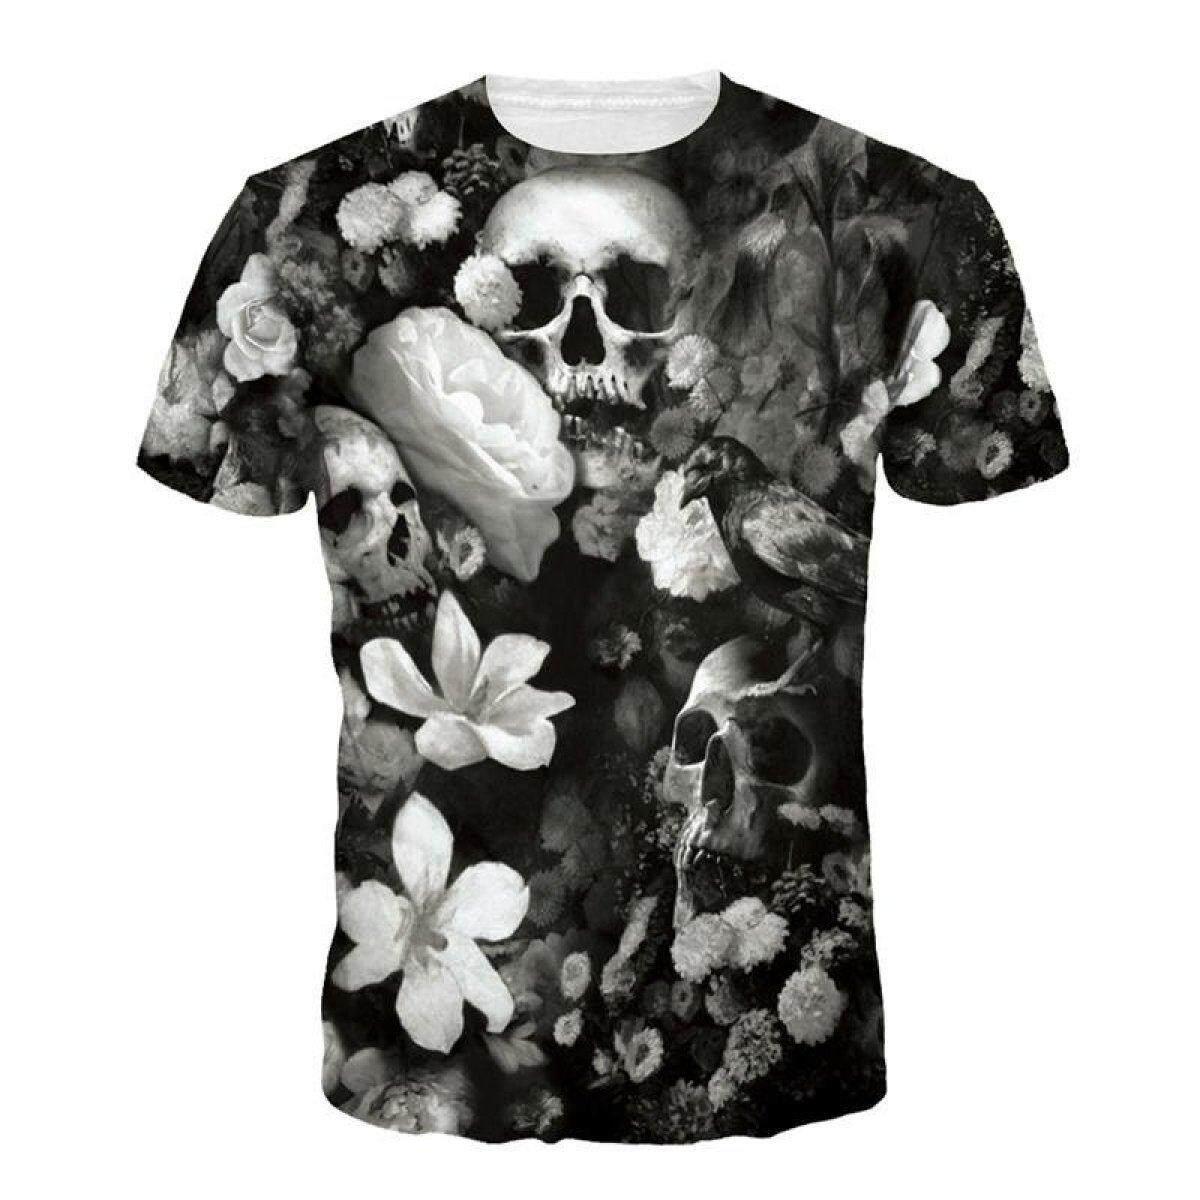 Jiayiqi Summer Casual Punk Floral Tee Shirt Clothes Fashion 3D Skull Print T -Shirts -